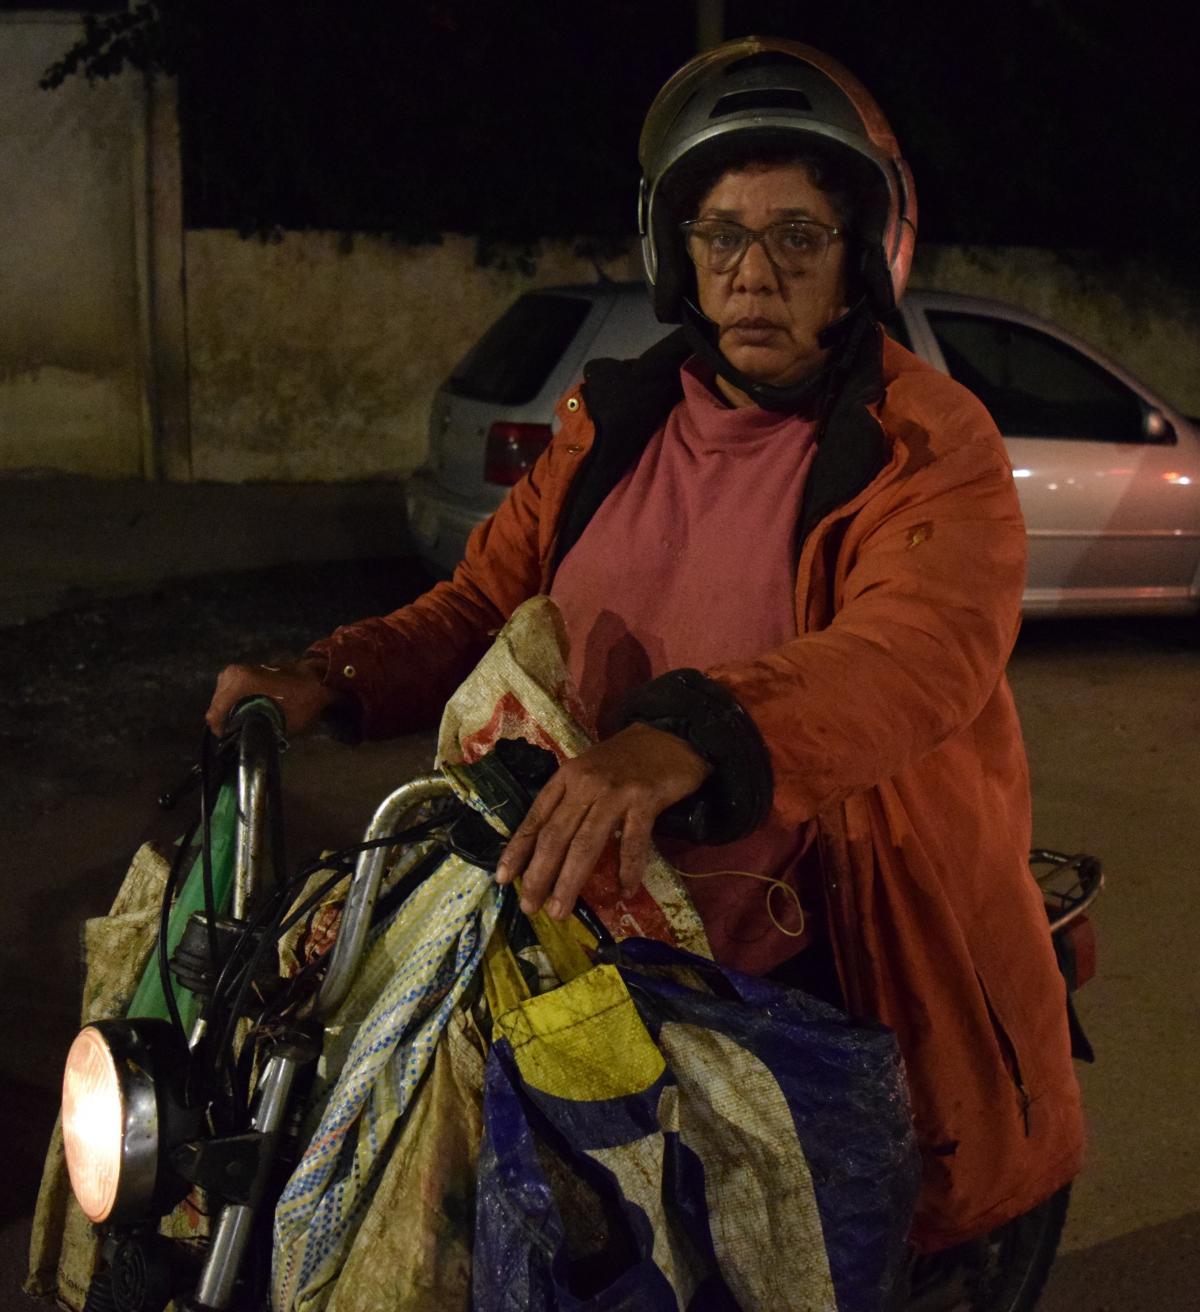 Atika Cherradi drives her motorbike around Rabat disepersing 50lbs of food scraps to the city's stray cats and dogs.